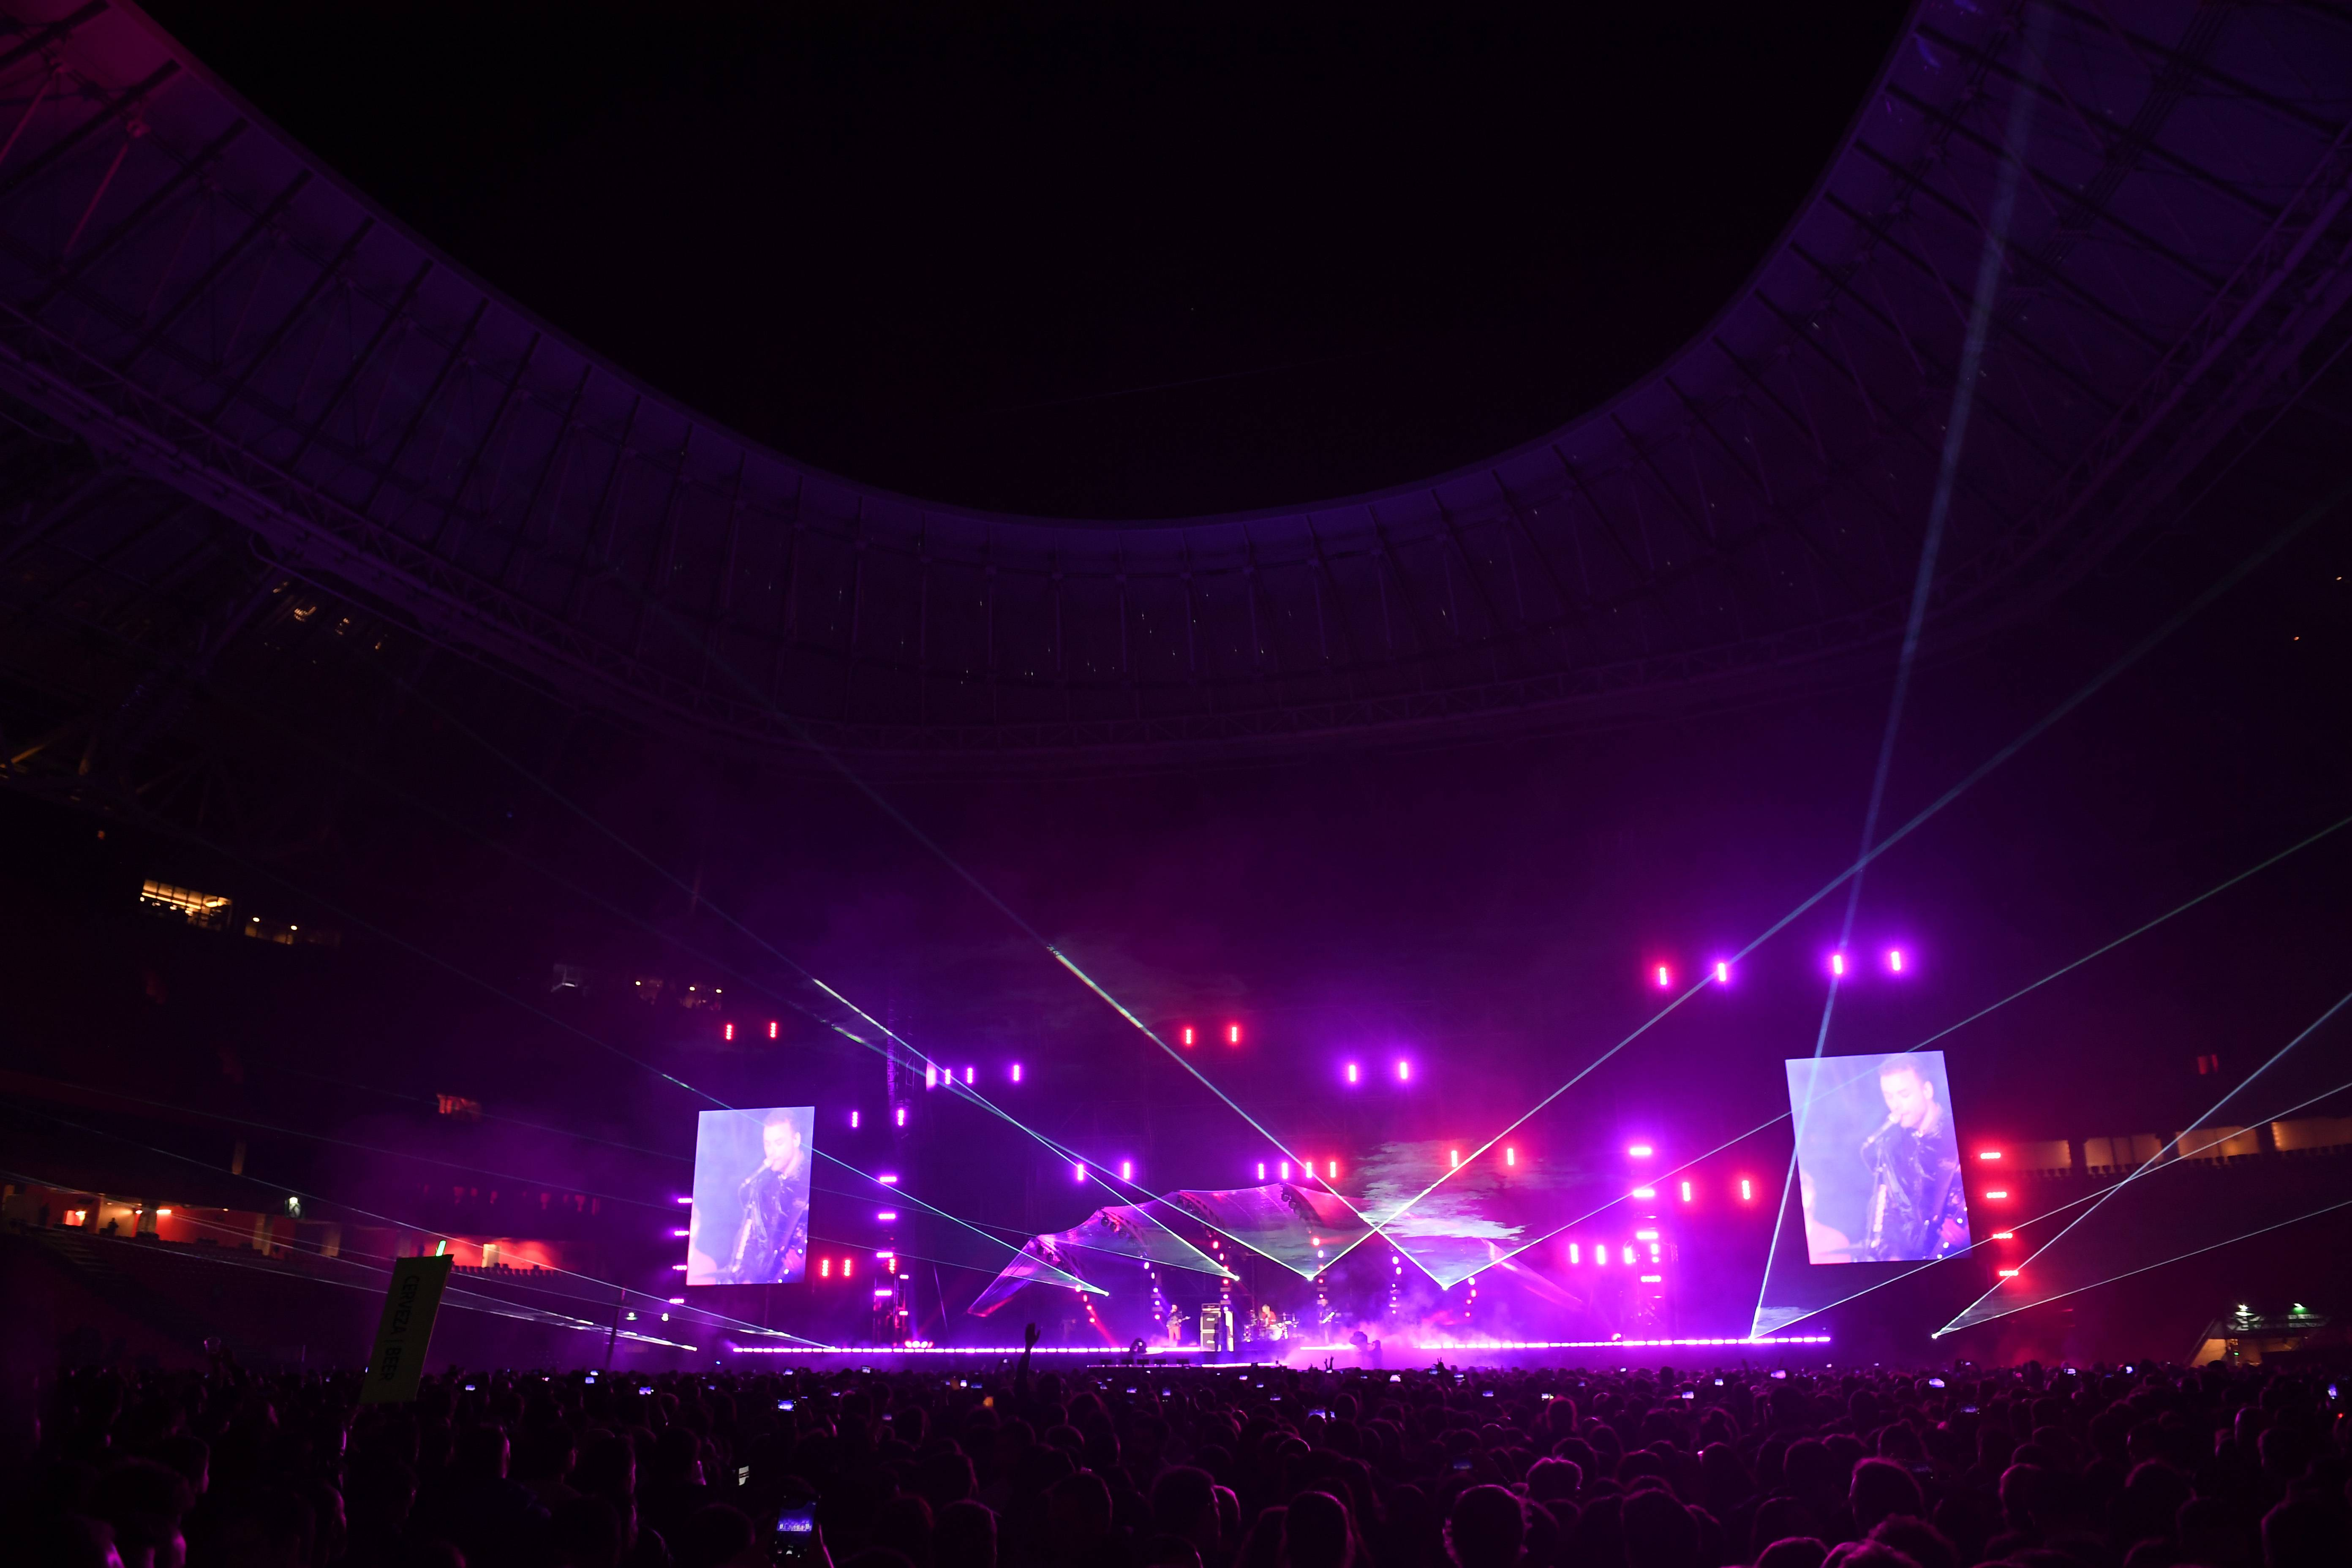 mgid:file:gsp:scenic:/international/mtv.es/images/Muse_-_MTV_World_Stage_-_MTV_EMAs_Bilbao_2018_-_23.JPG